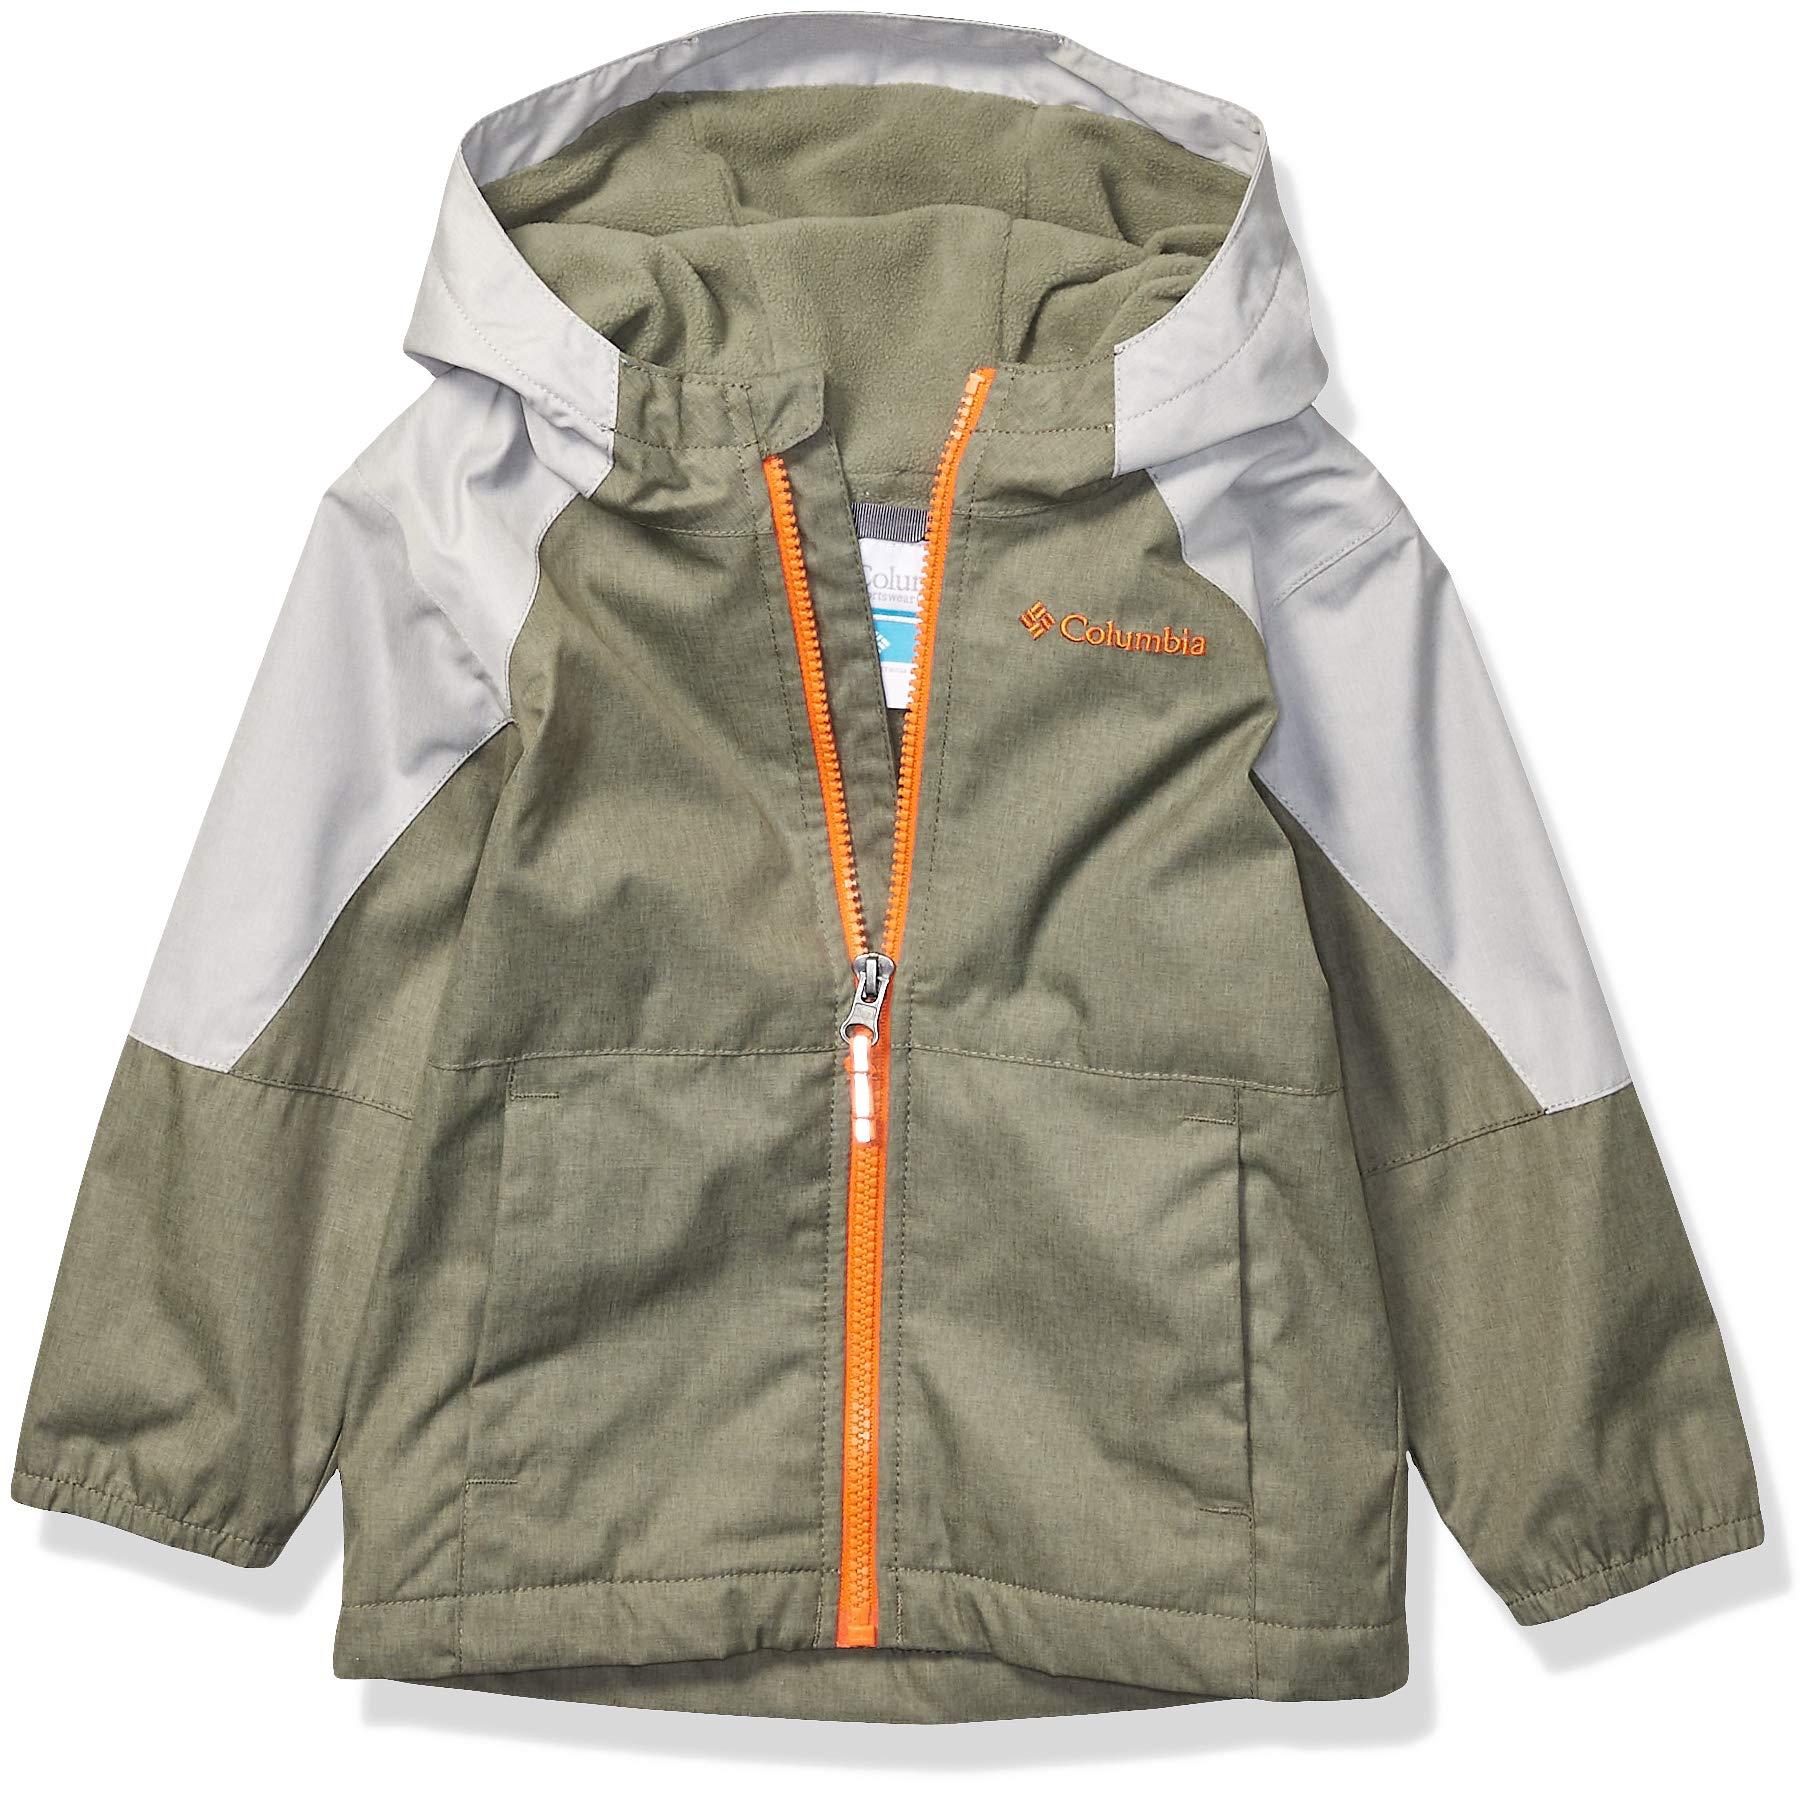 Columbia Boys' Toddler Endless Explorer Jacket, Cypress Colm Grey Heather, 3T